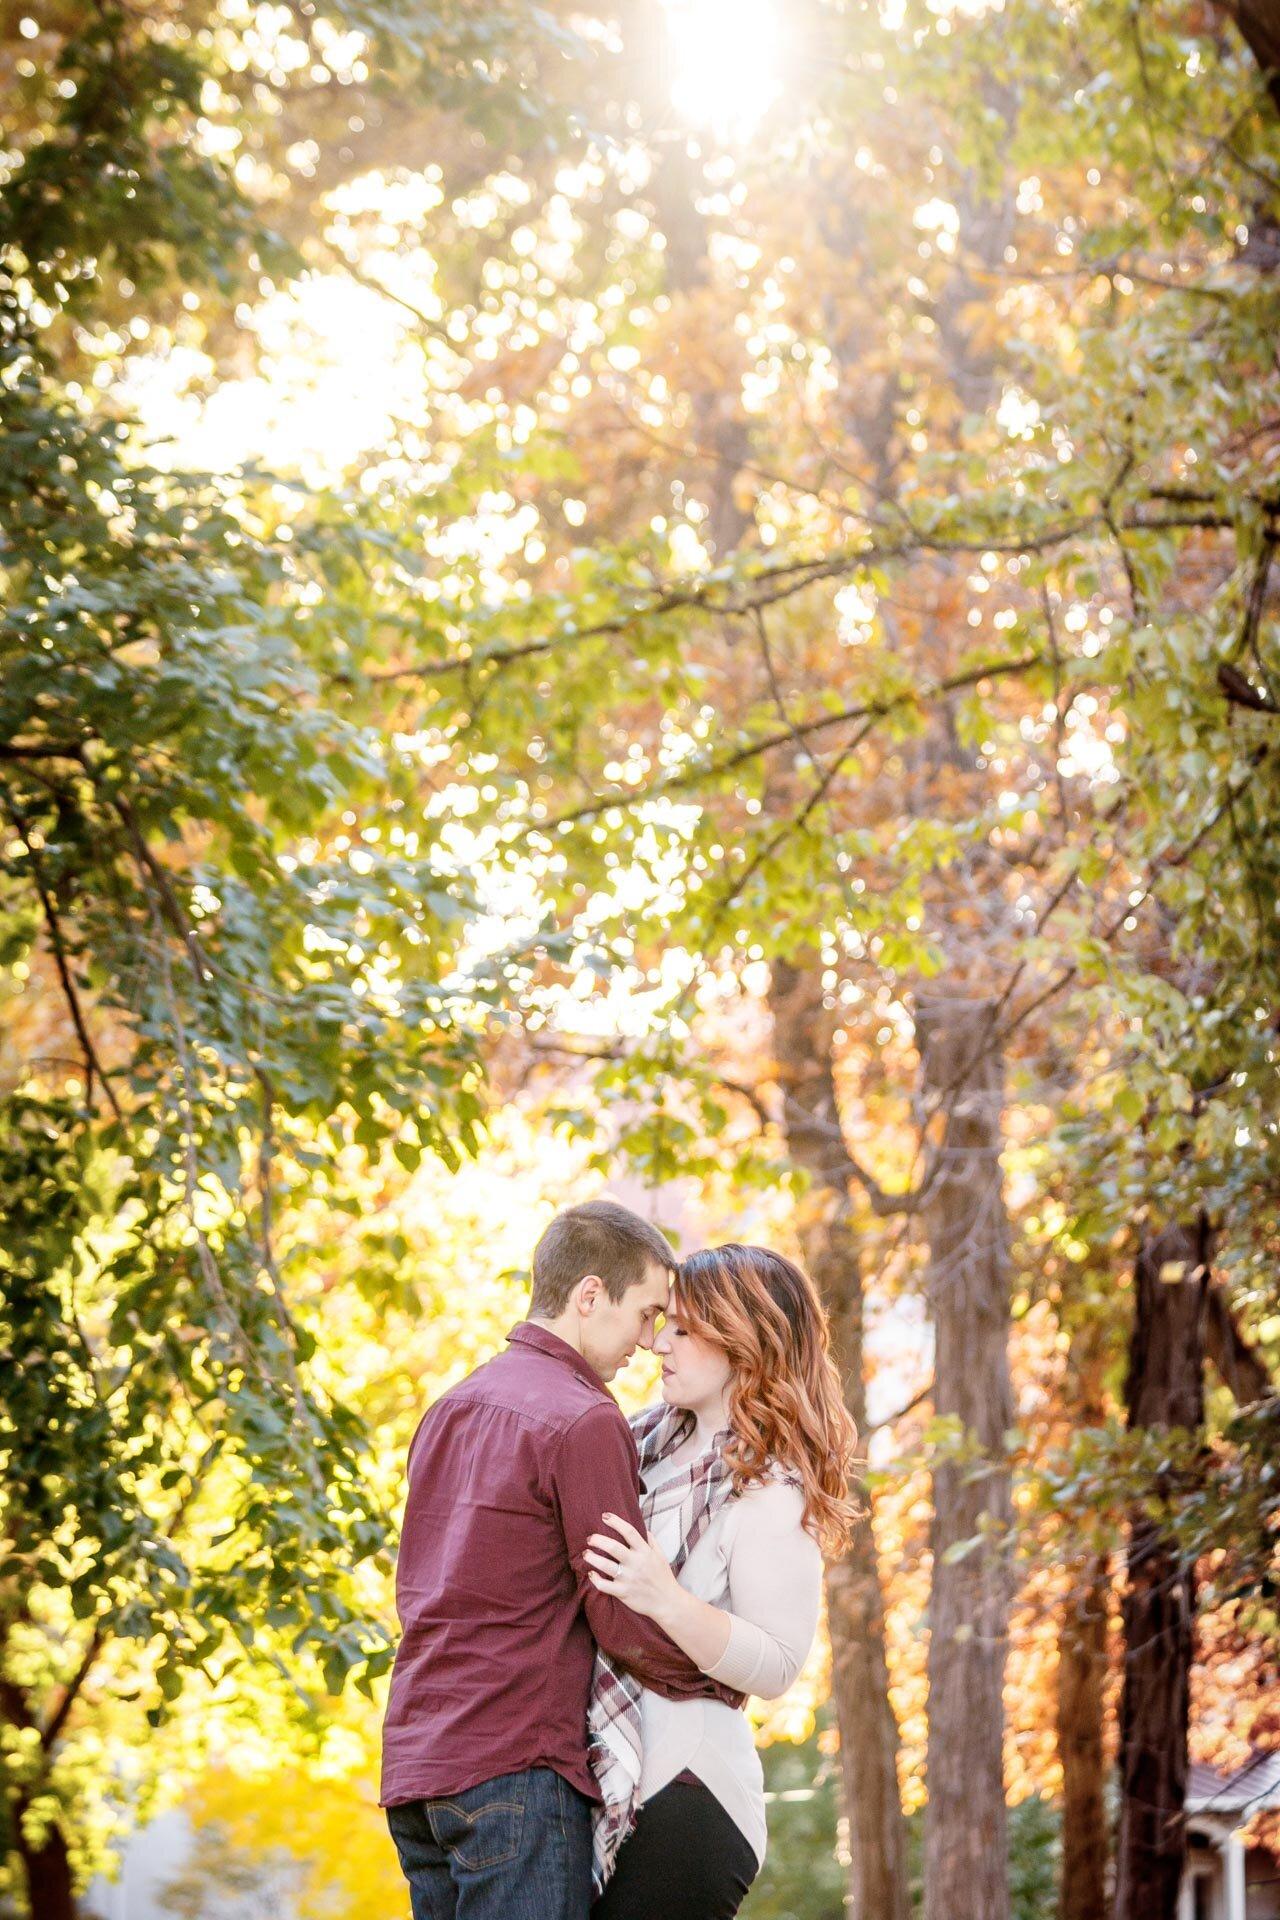 fall-lighting-adam-shea-photography-wedding-engagement-blog-adam-shea-photography-green-bay-appleton-neenah-photographer-19.jpg